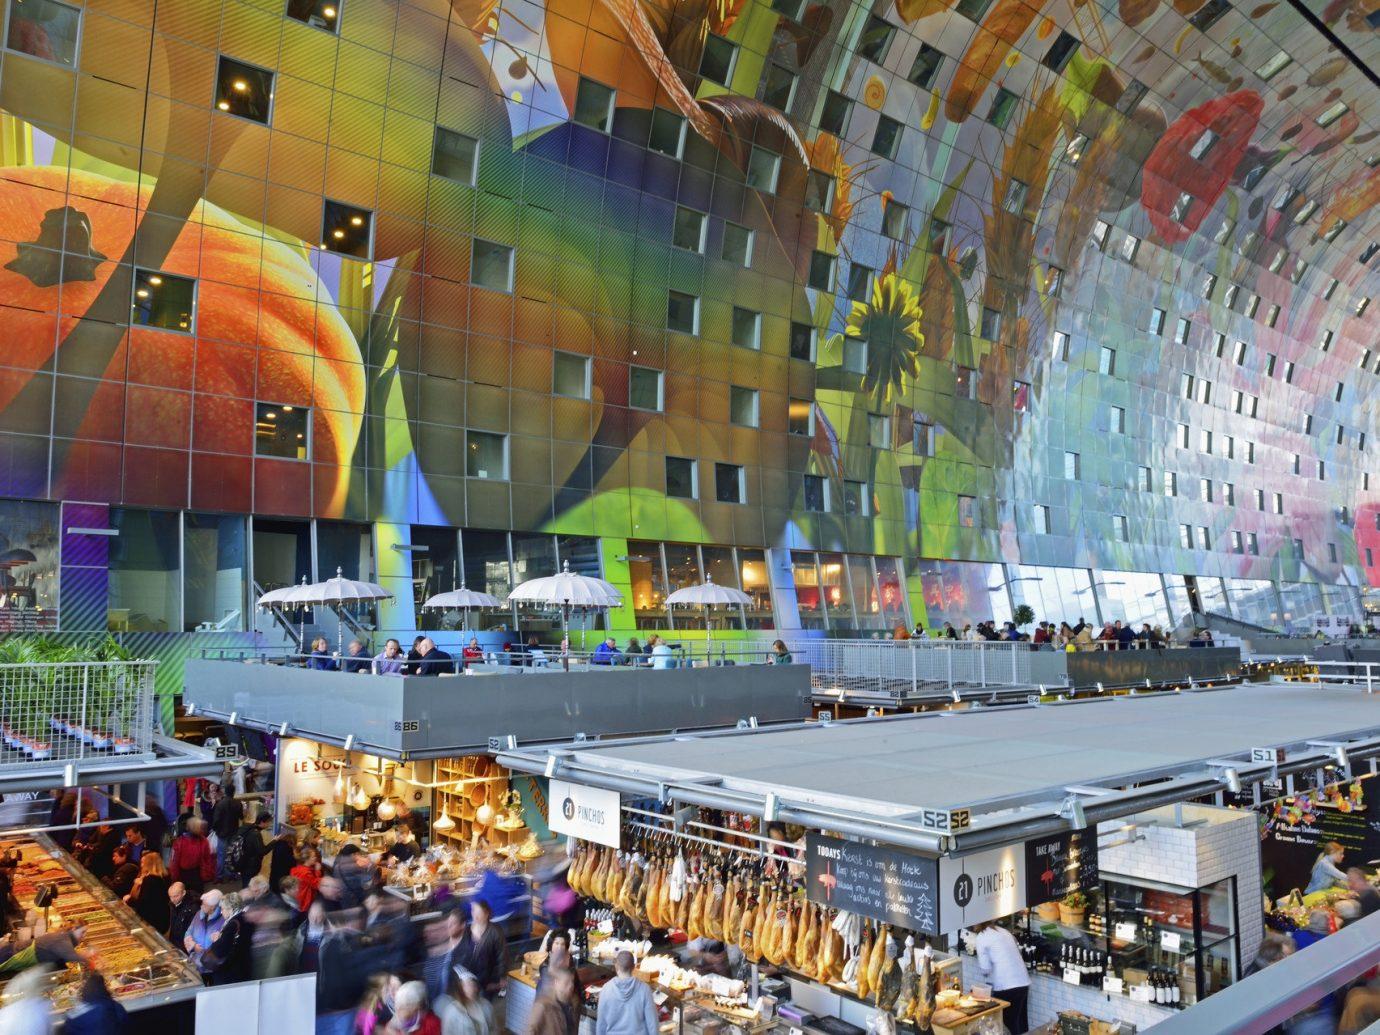 Trip Ideas indoor sport venue arena shopping mall infrastructure stadium marketplace plaza